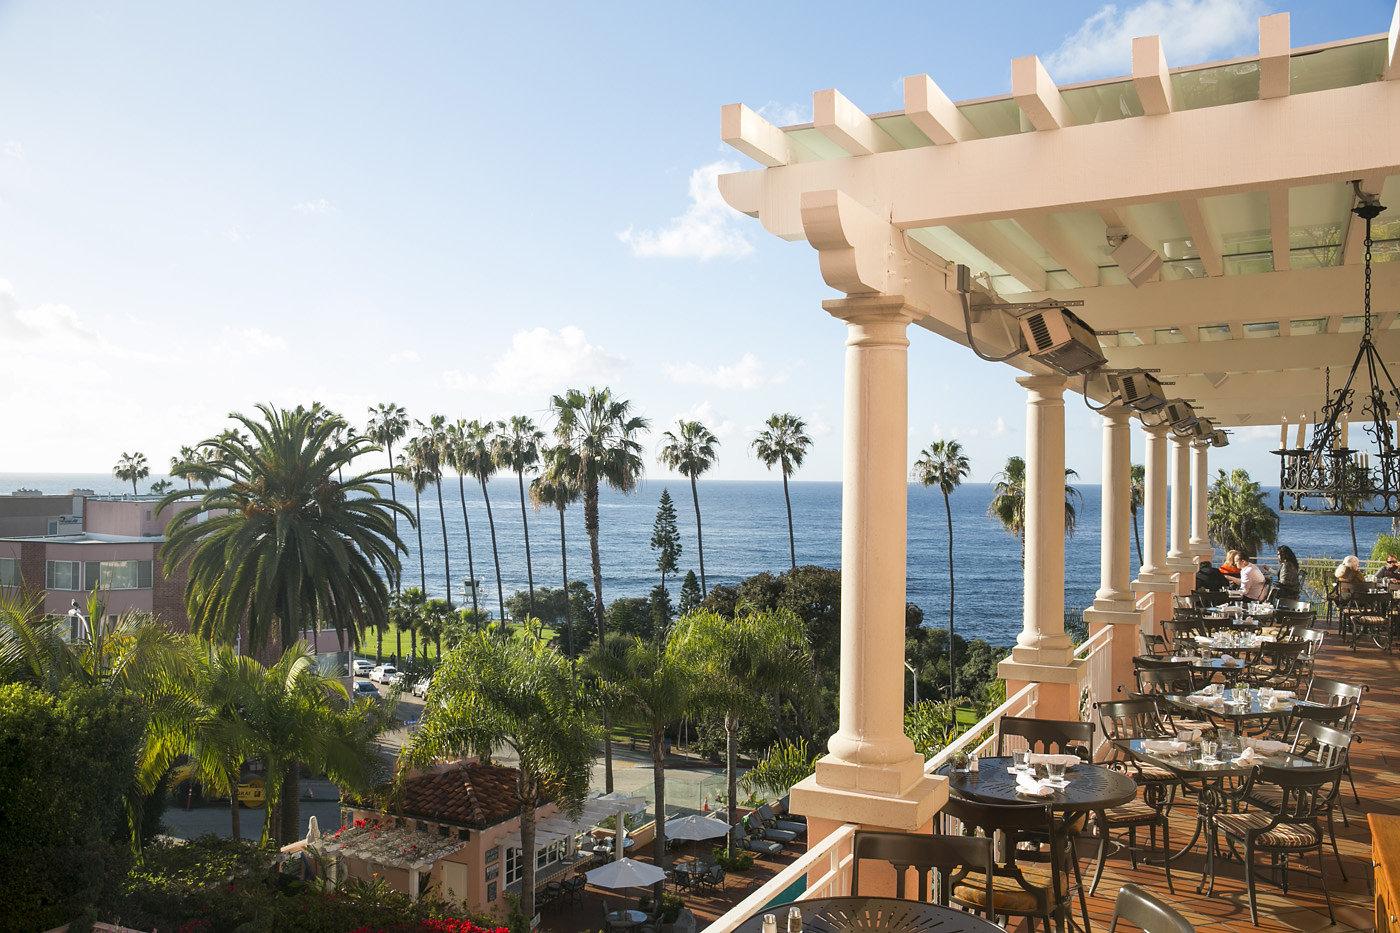 THE MED restaurant at La Valencia Hotel in La Jolla